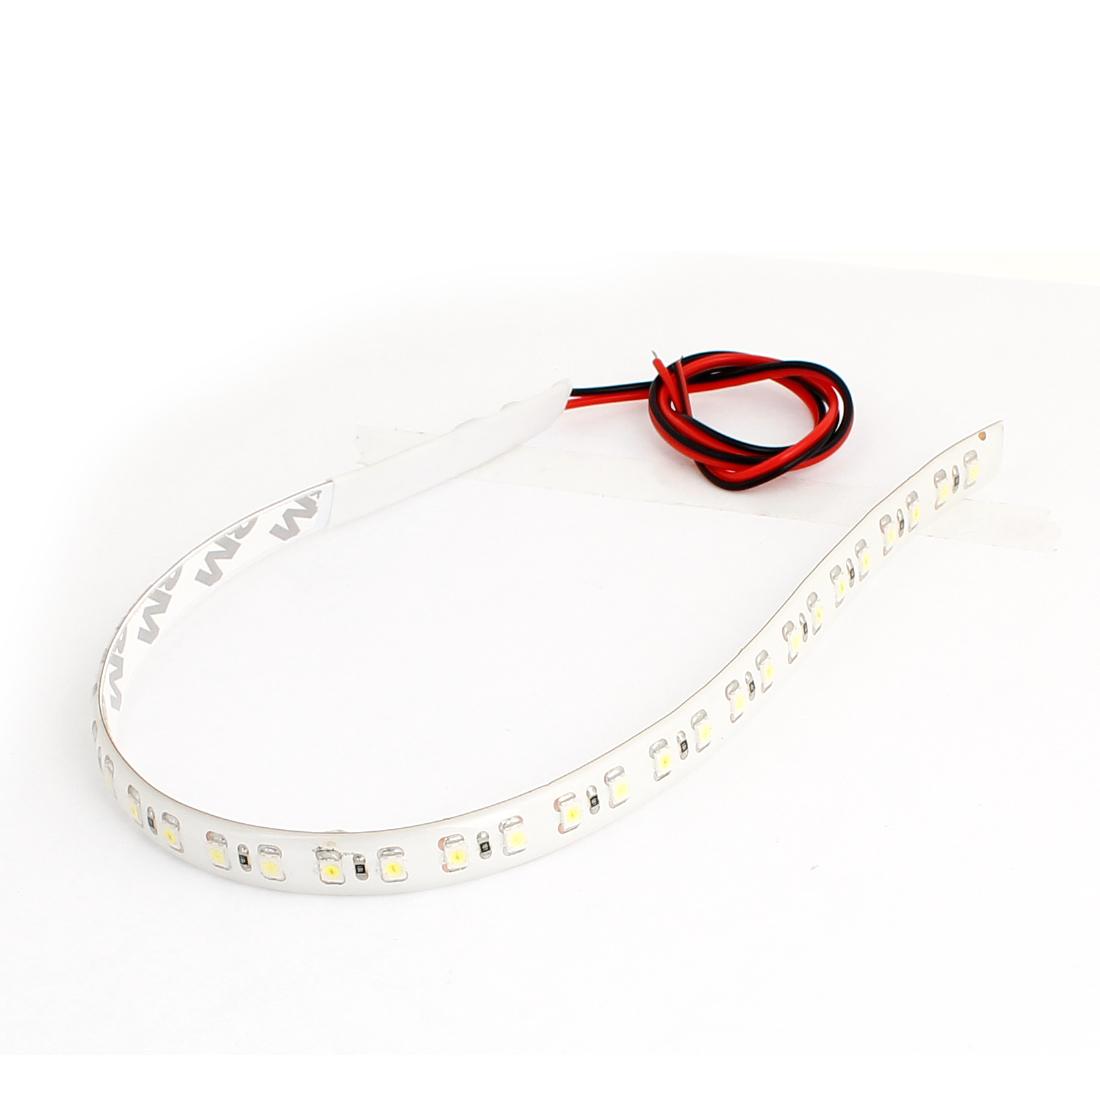 Adhesive Tape White 32 SMD LEDs Auto Car Flexible Flash LED Strip 30cm